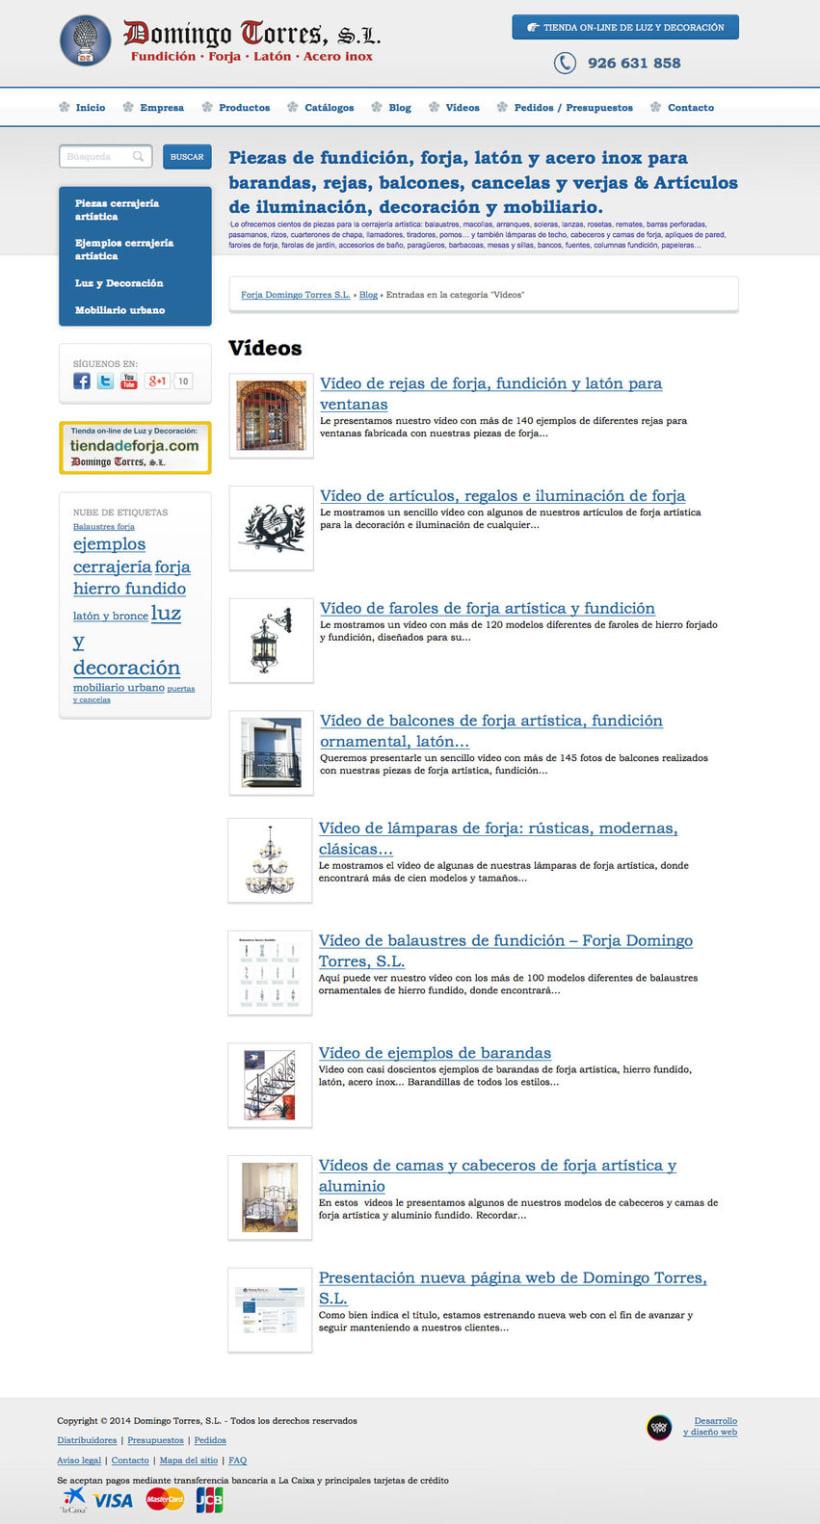 Domingo torres gestor de contenidos de empresa de forja - Domingo torres forja ...